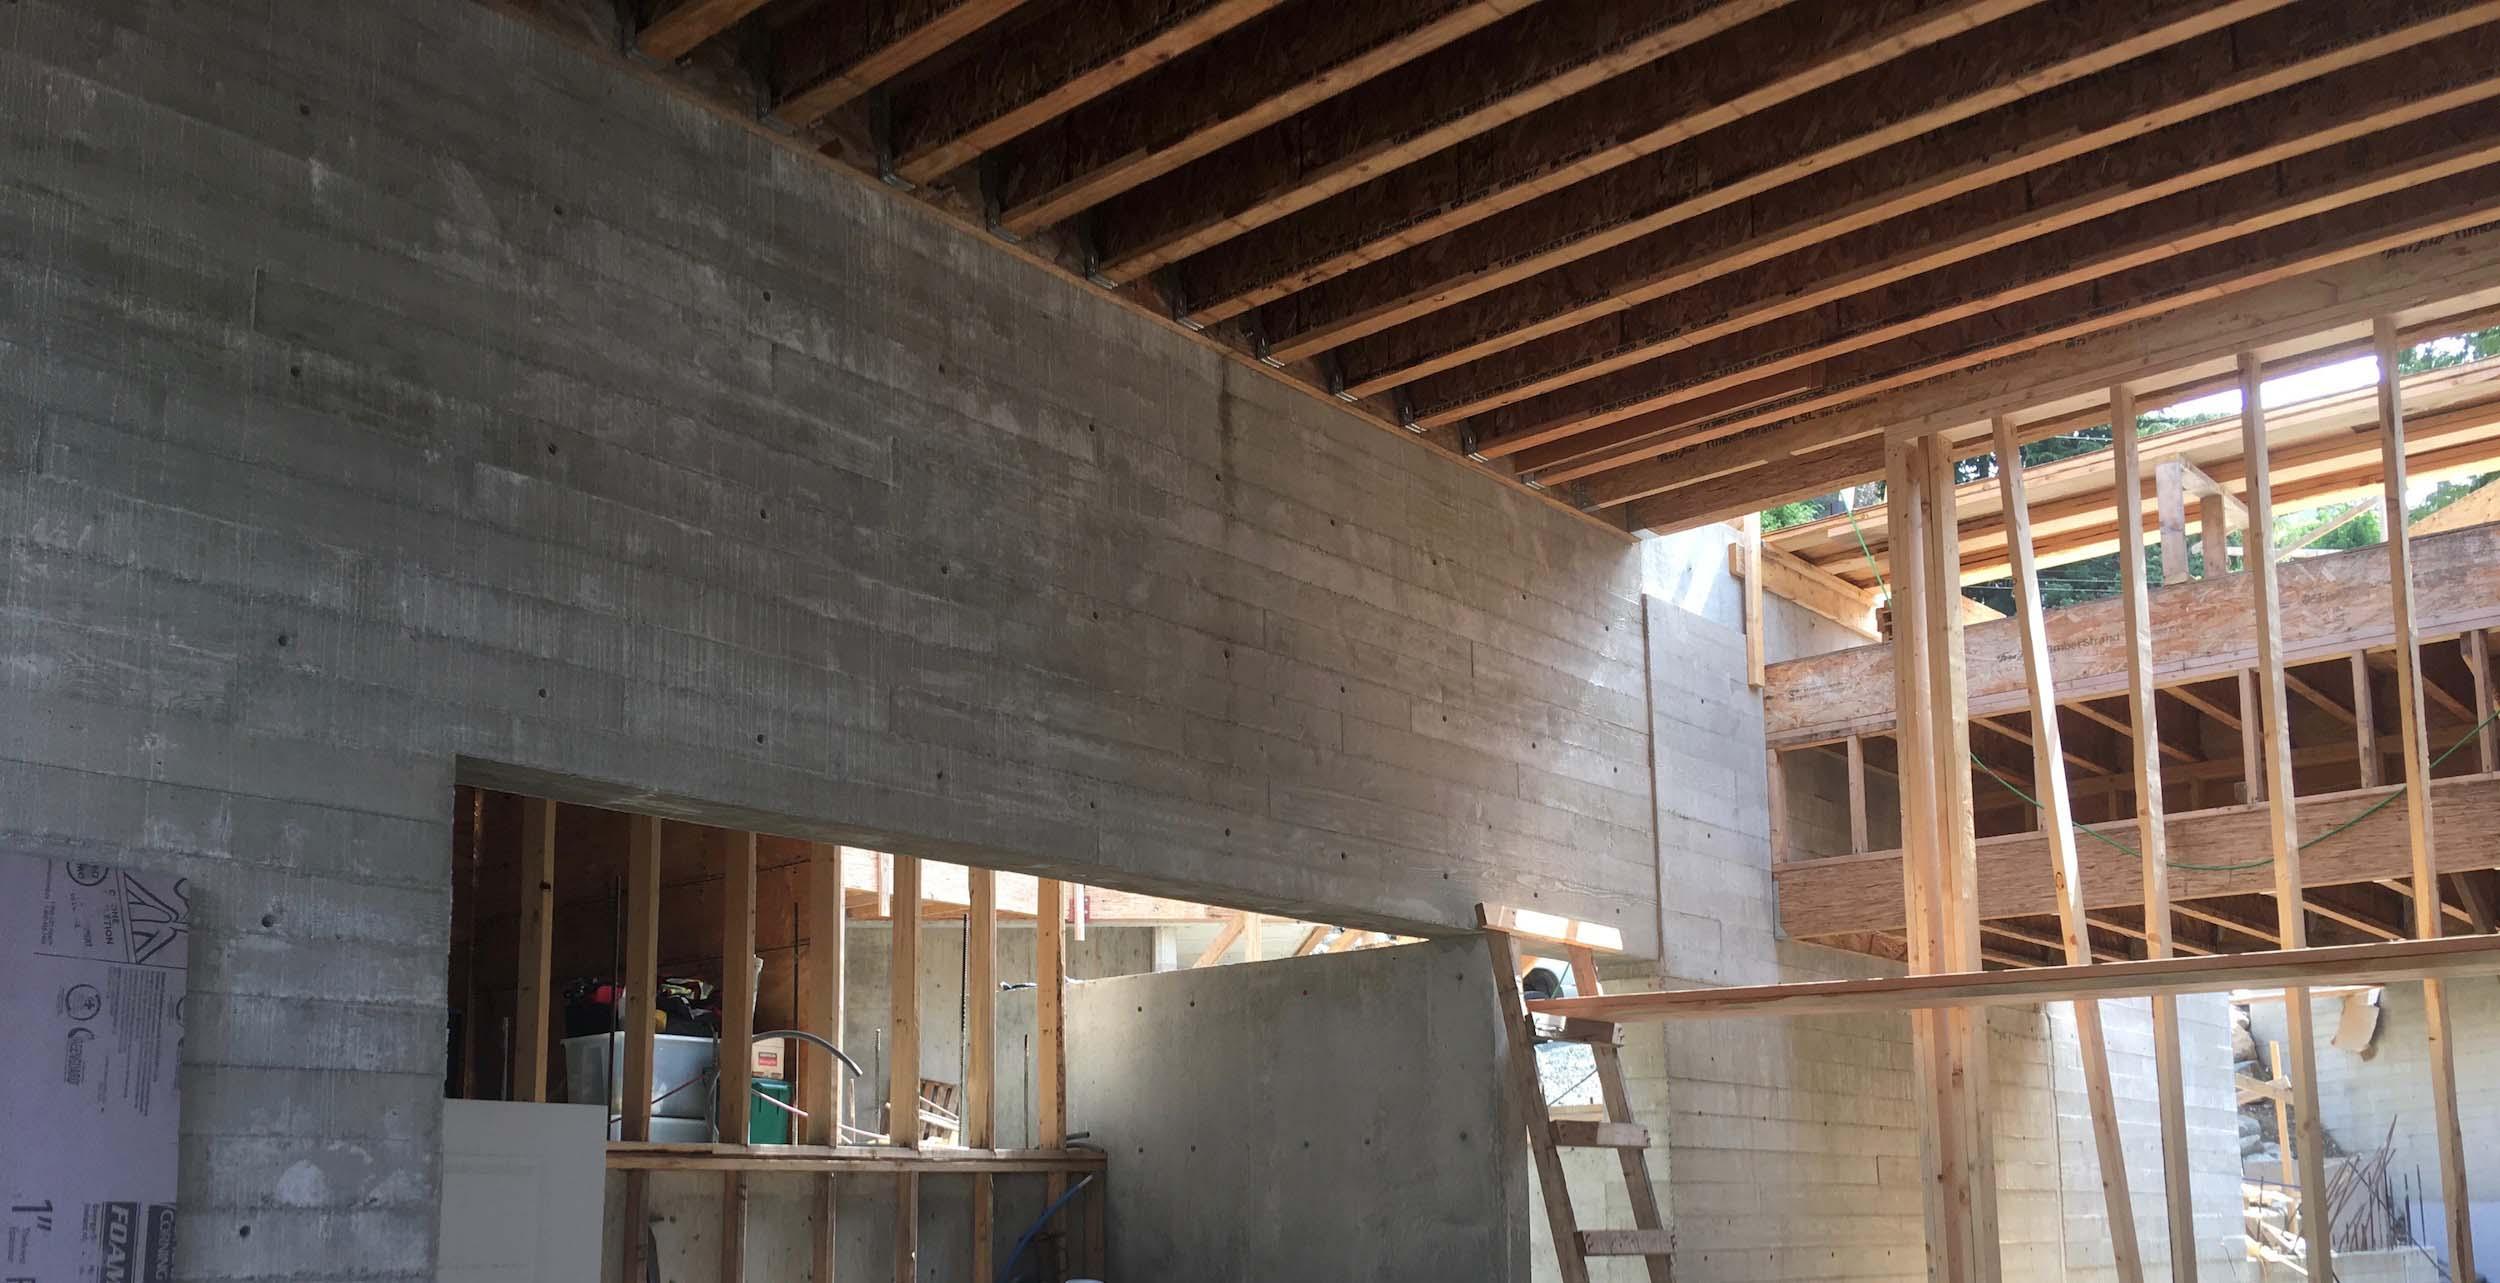 Postle_Construction_ConcreteForming23.jpg